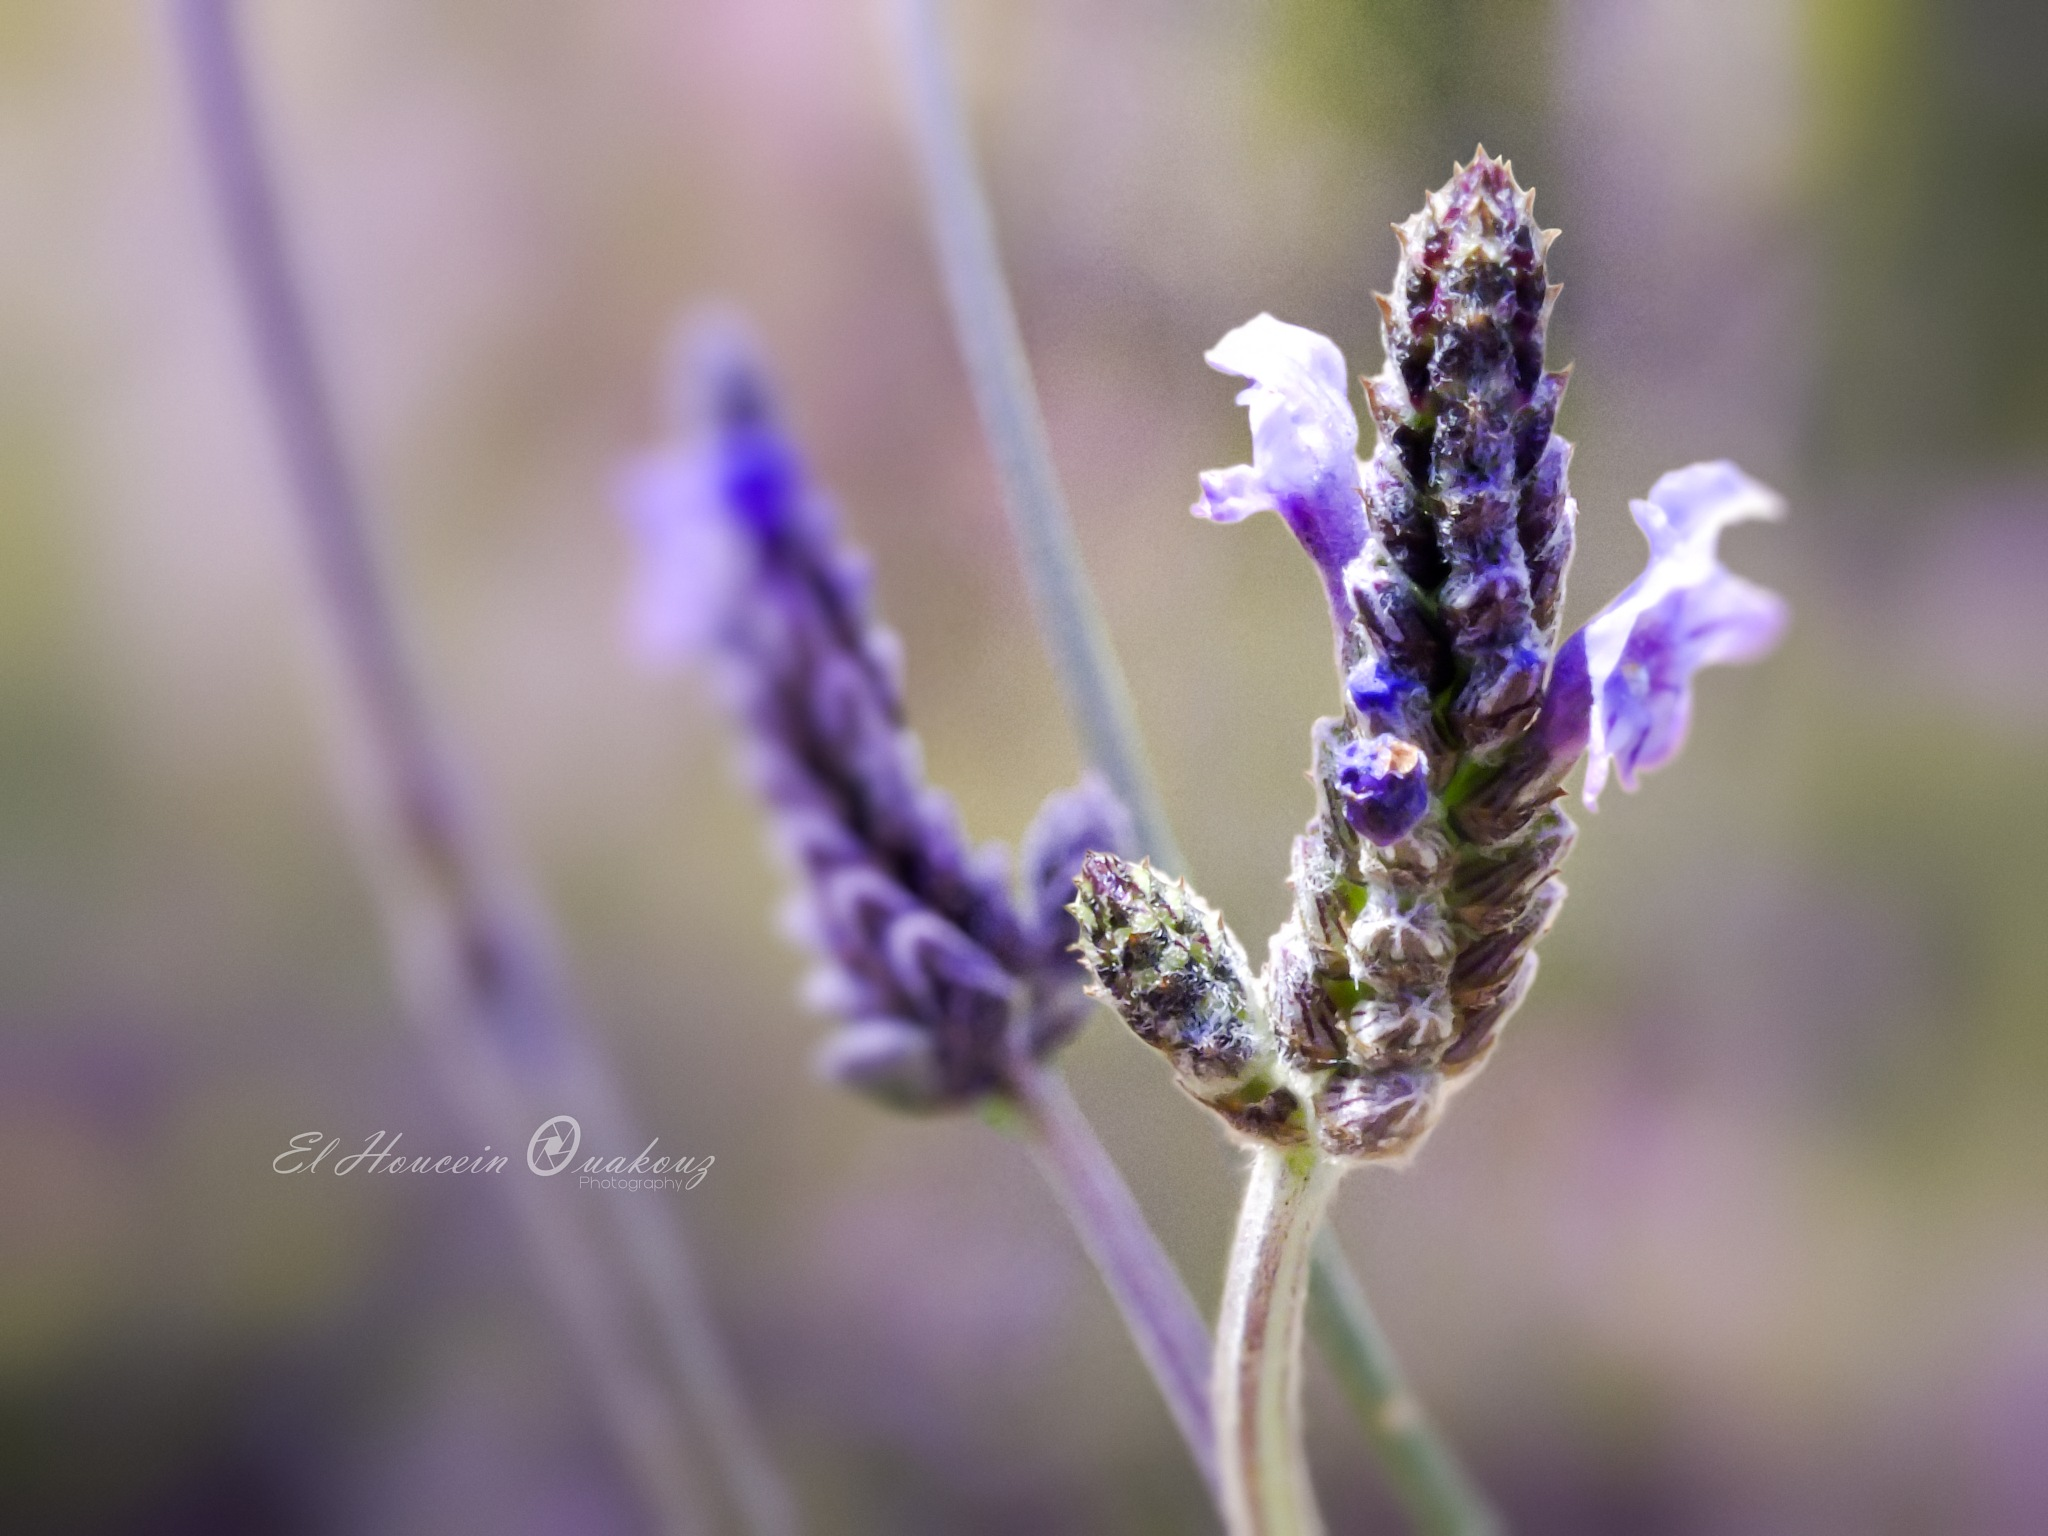 Flowers by El Houcein Ouakouz